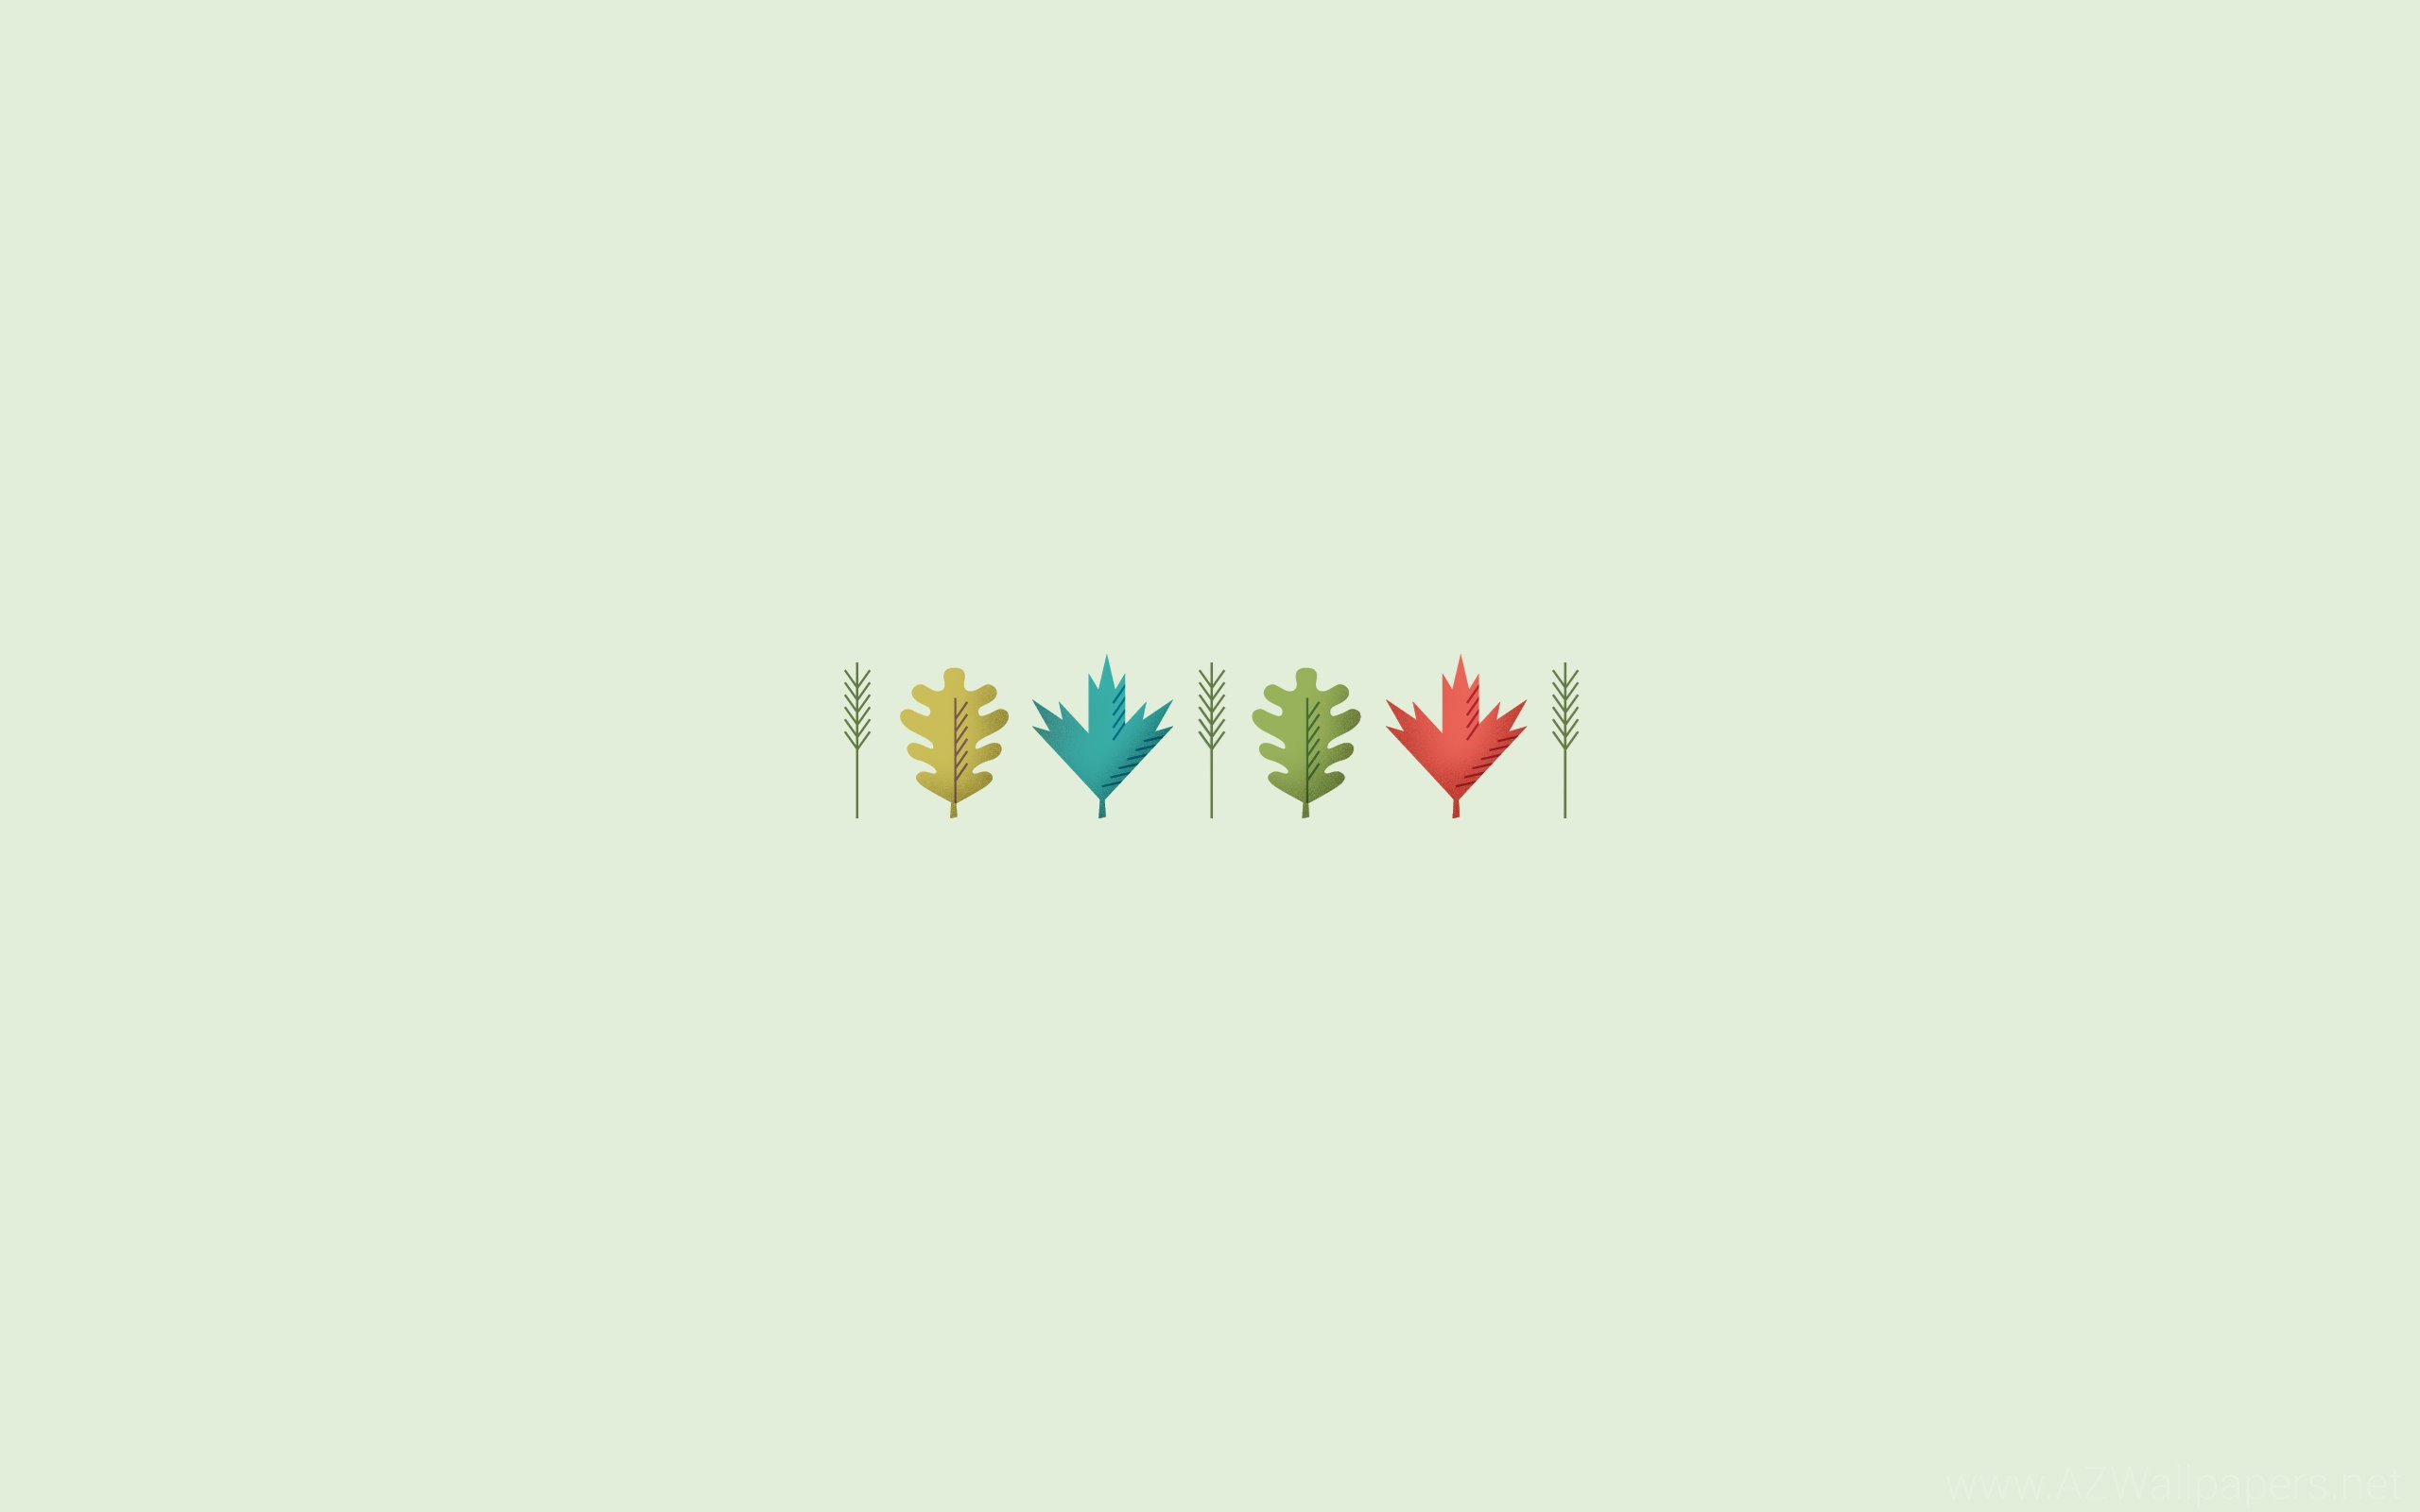 Simple Cute Desktop Wallpapers (58+ Images